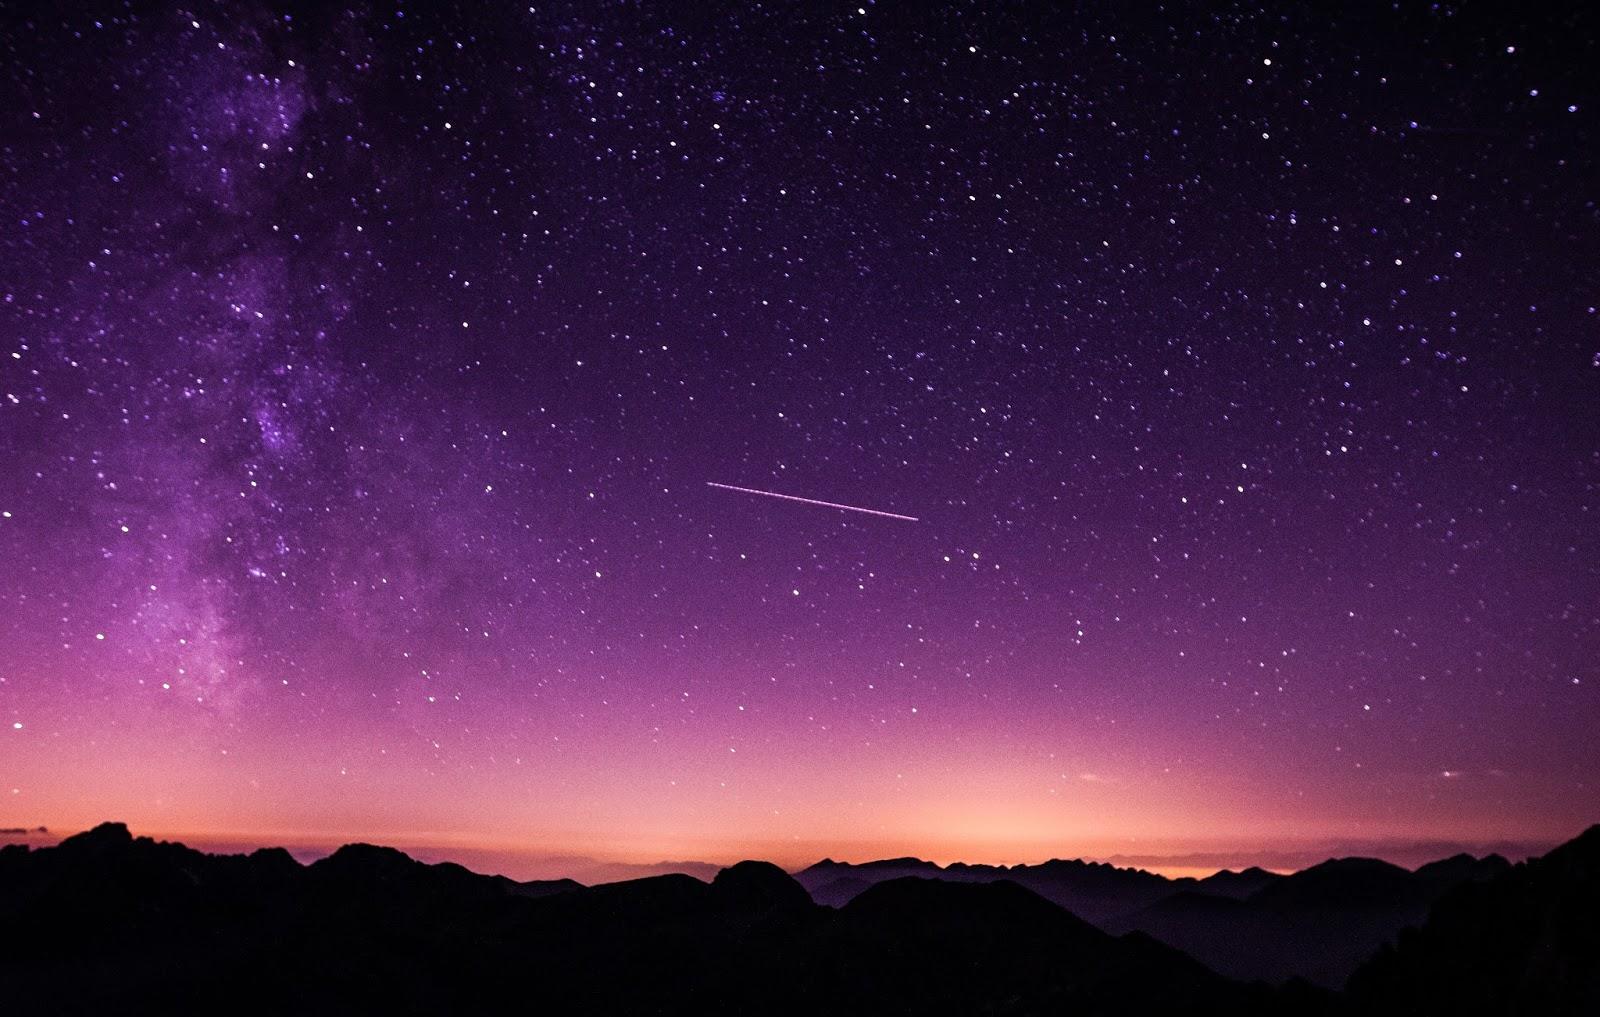 Eu beijo as estrelas